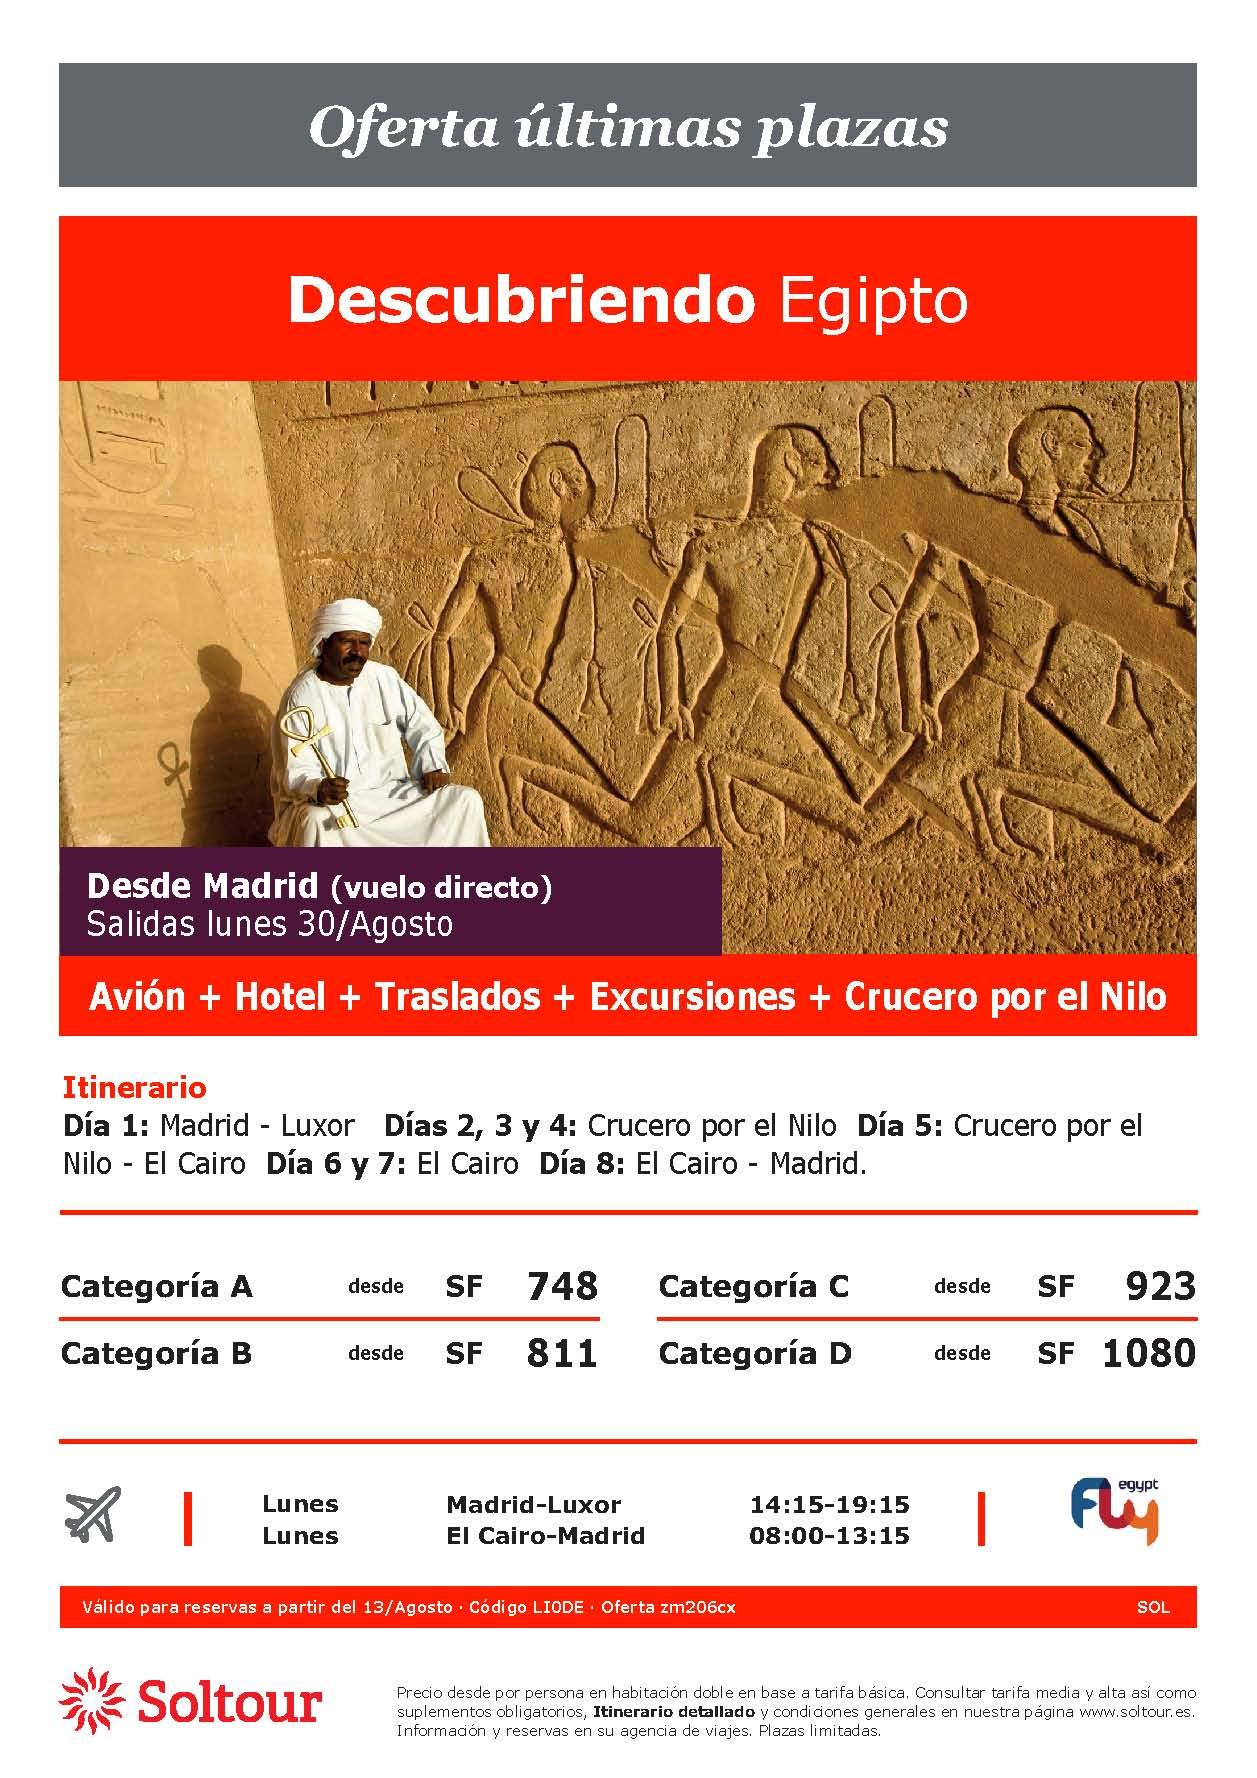 Oferta Soltour Ultima Hora Circuito Descubriendo Egipto en avion con crucero desde Madrid Verano 2021